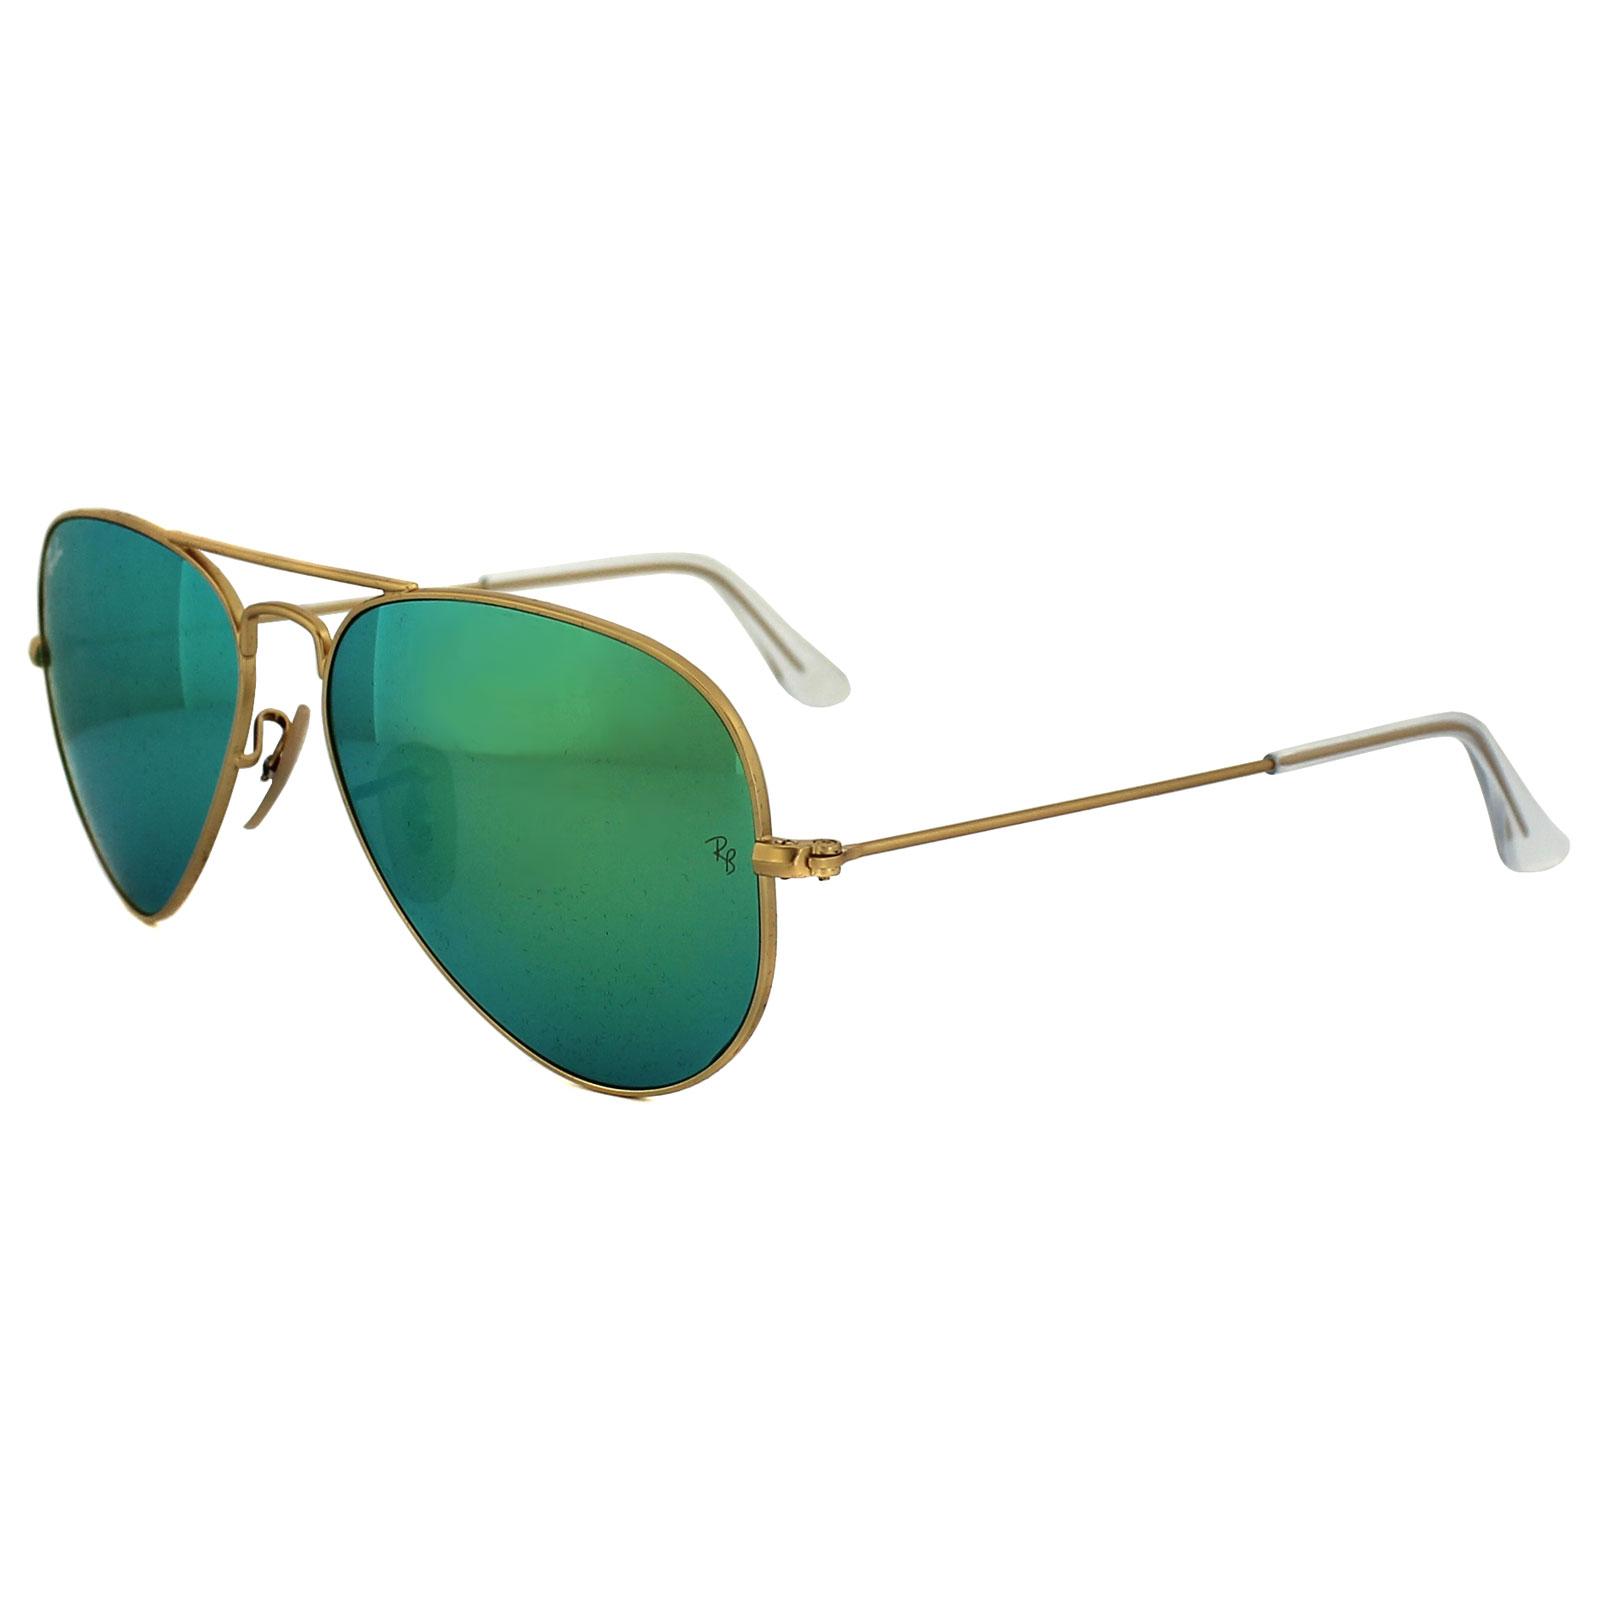 ce0a1c73dfb70 CENTINELA Gafas de sol Ray-Ban Aviator 3025 112 19 Flash verde oro espejo  pequeño